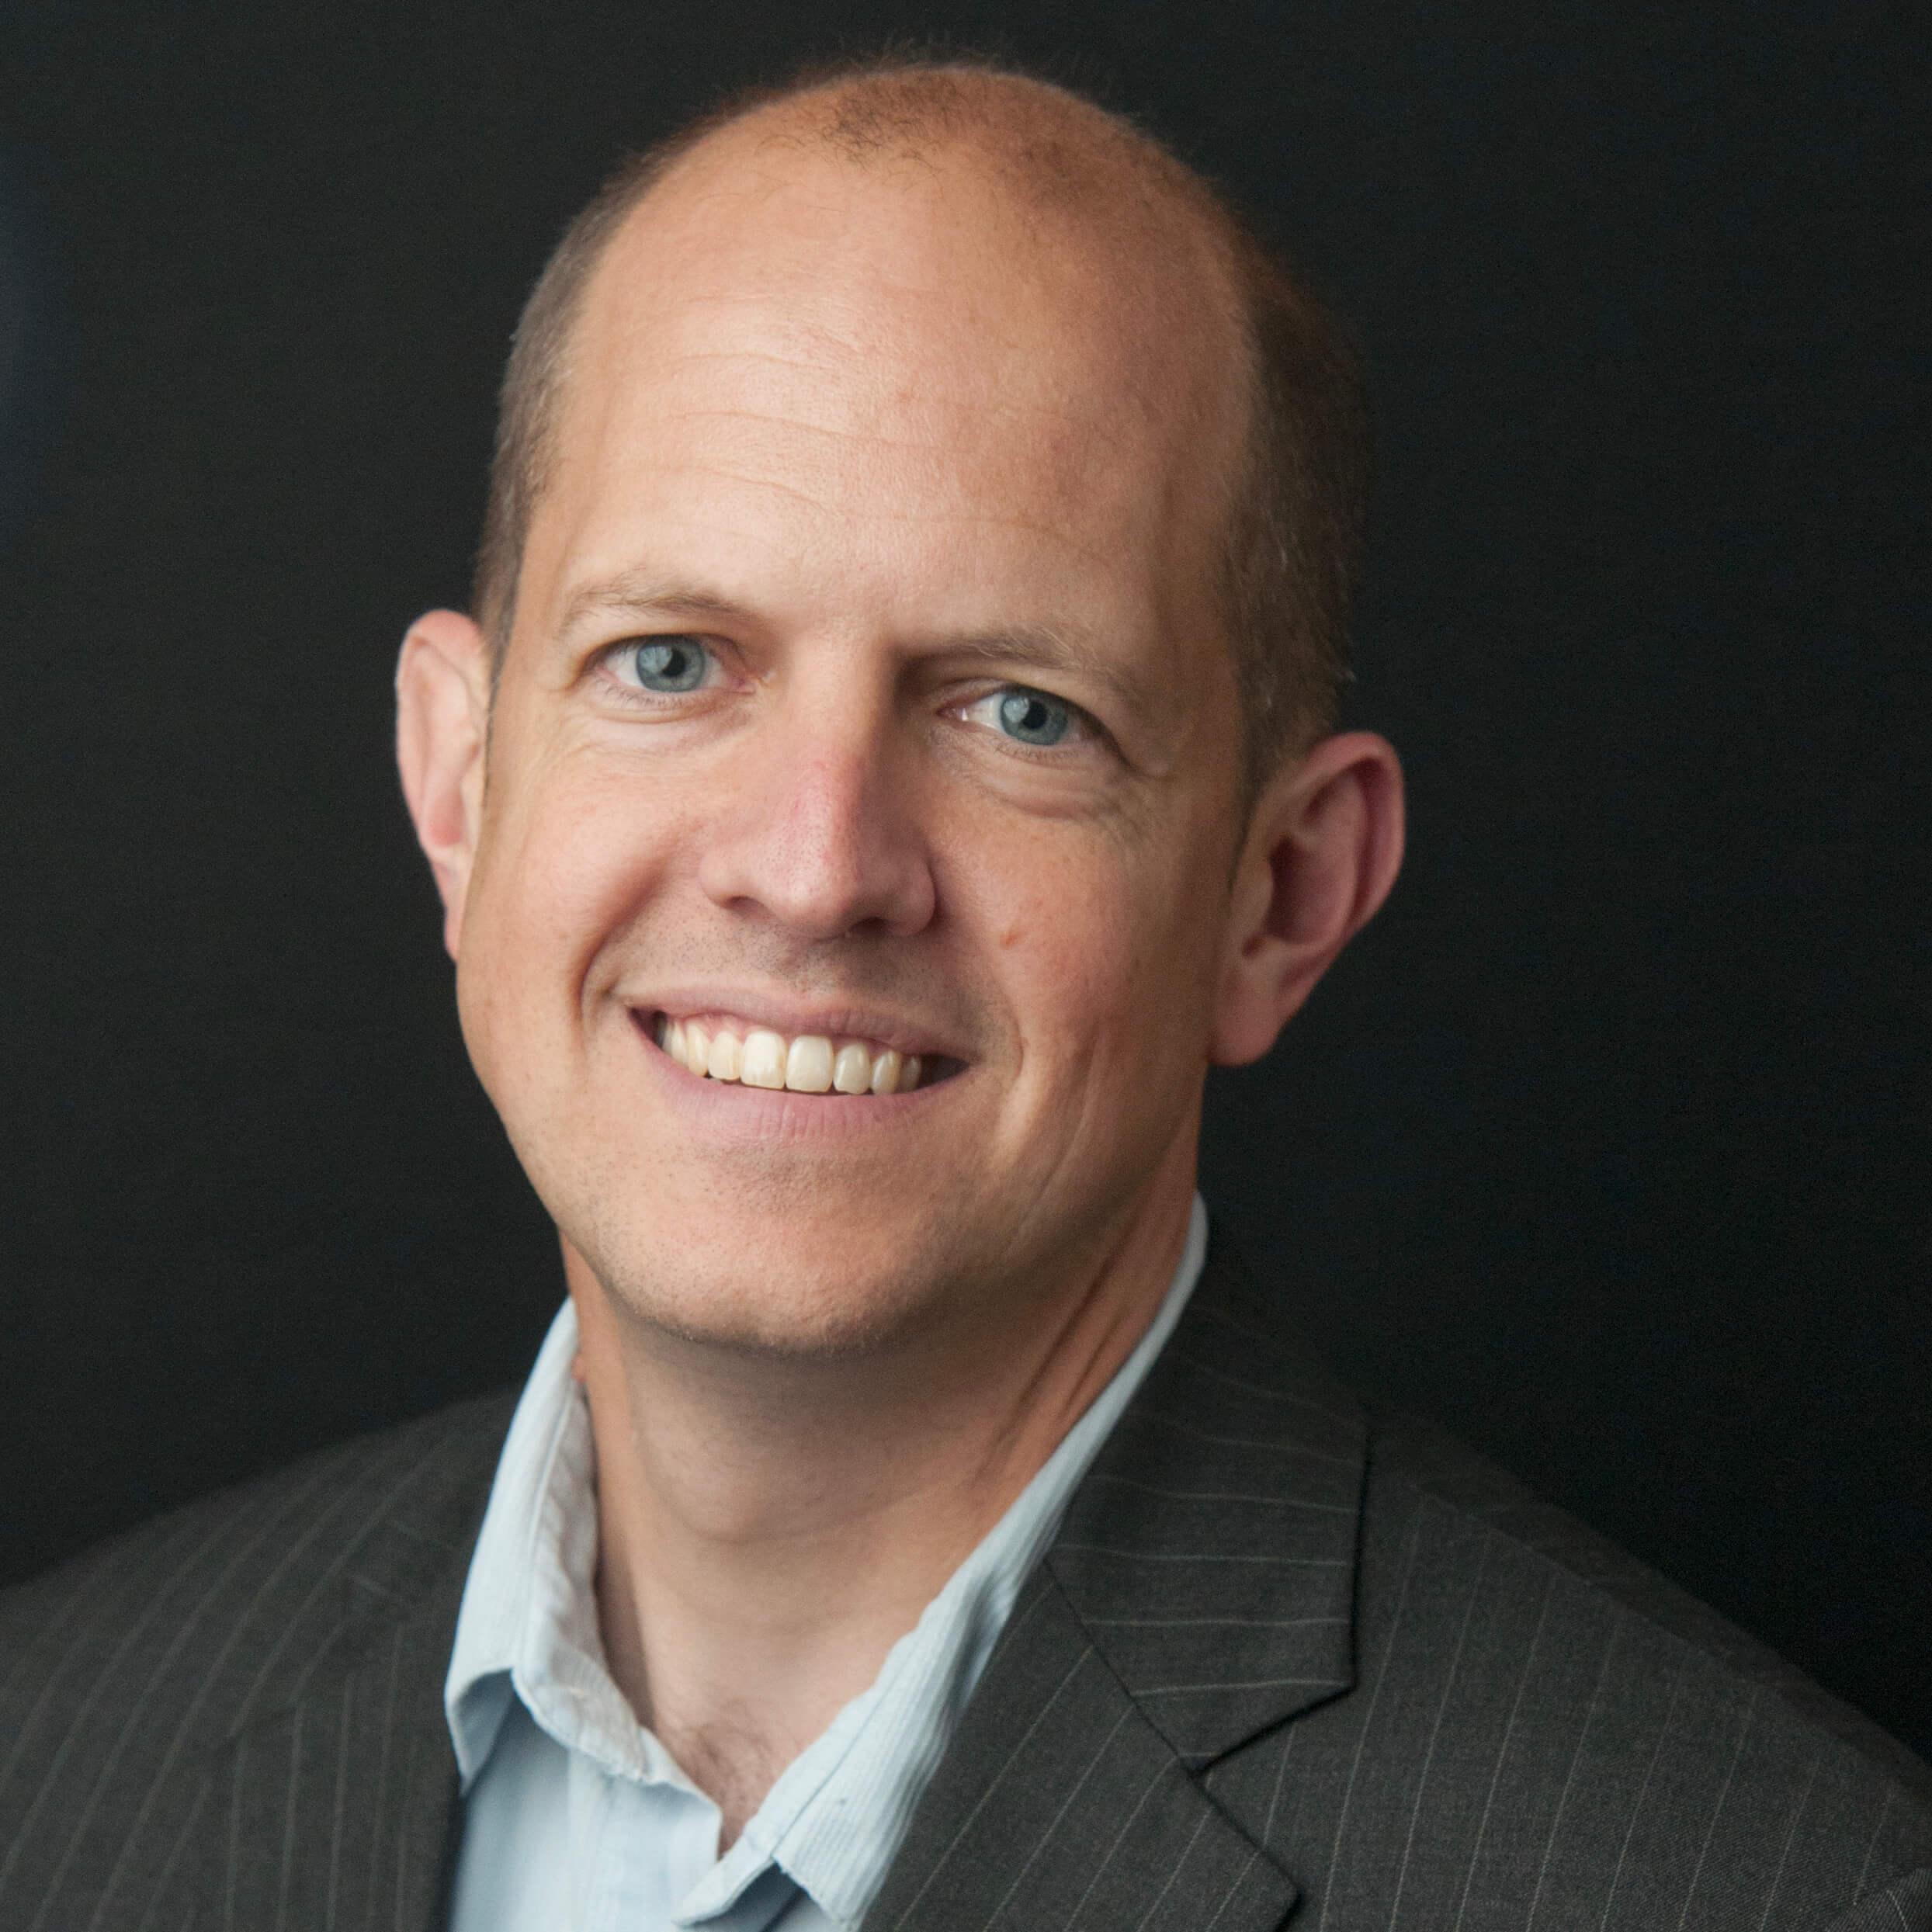 Jeff Lunglhofer